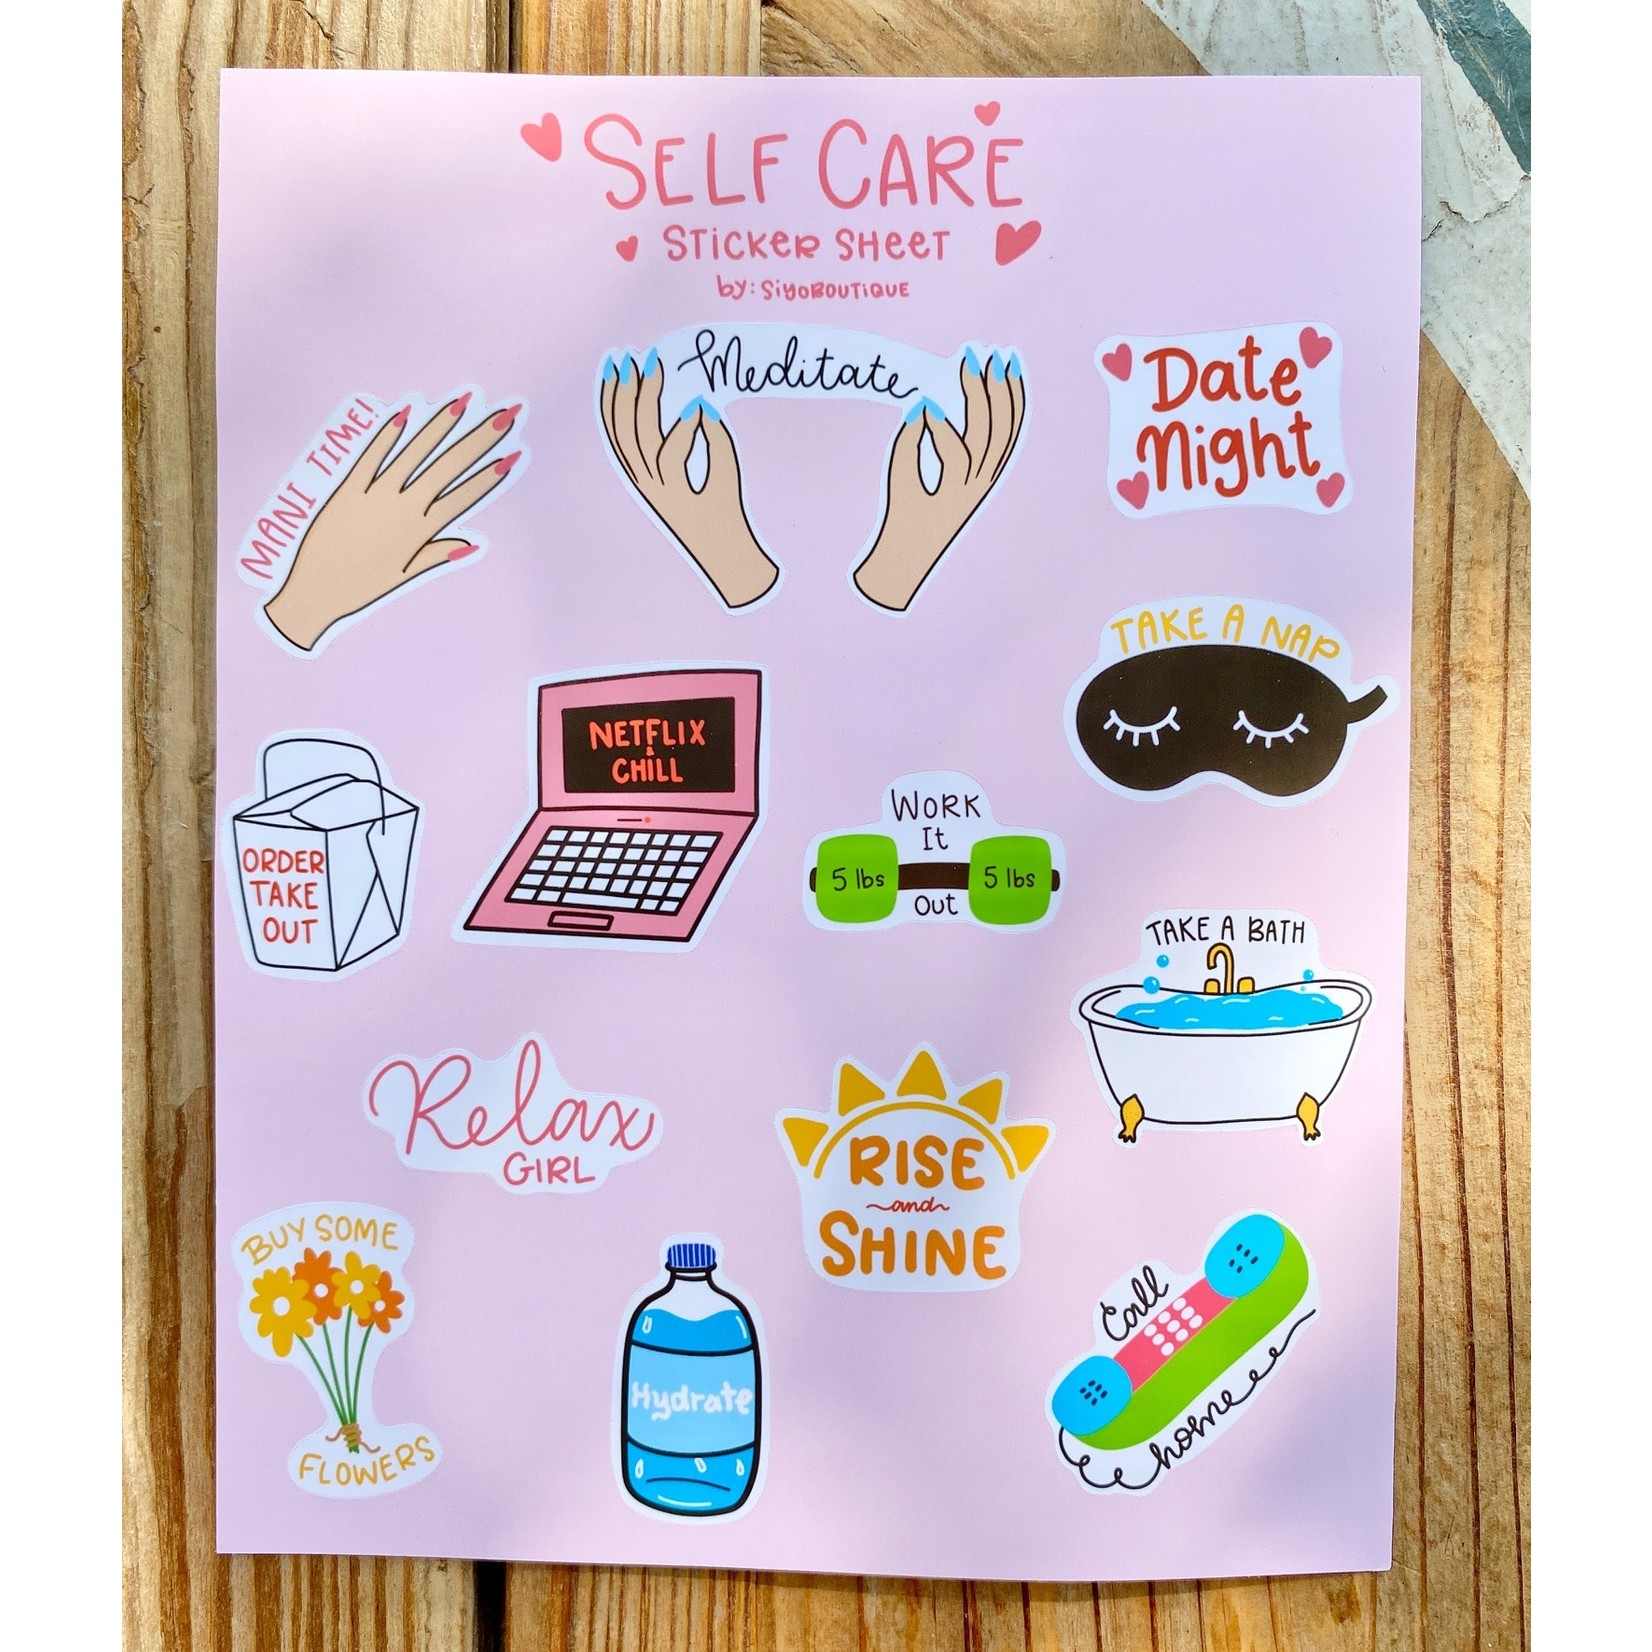 Siyo Boutique (BO) Planner Sticker Sheet Sets